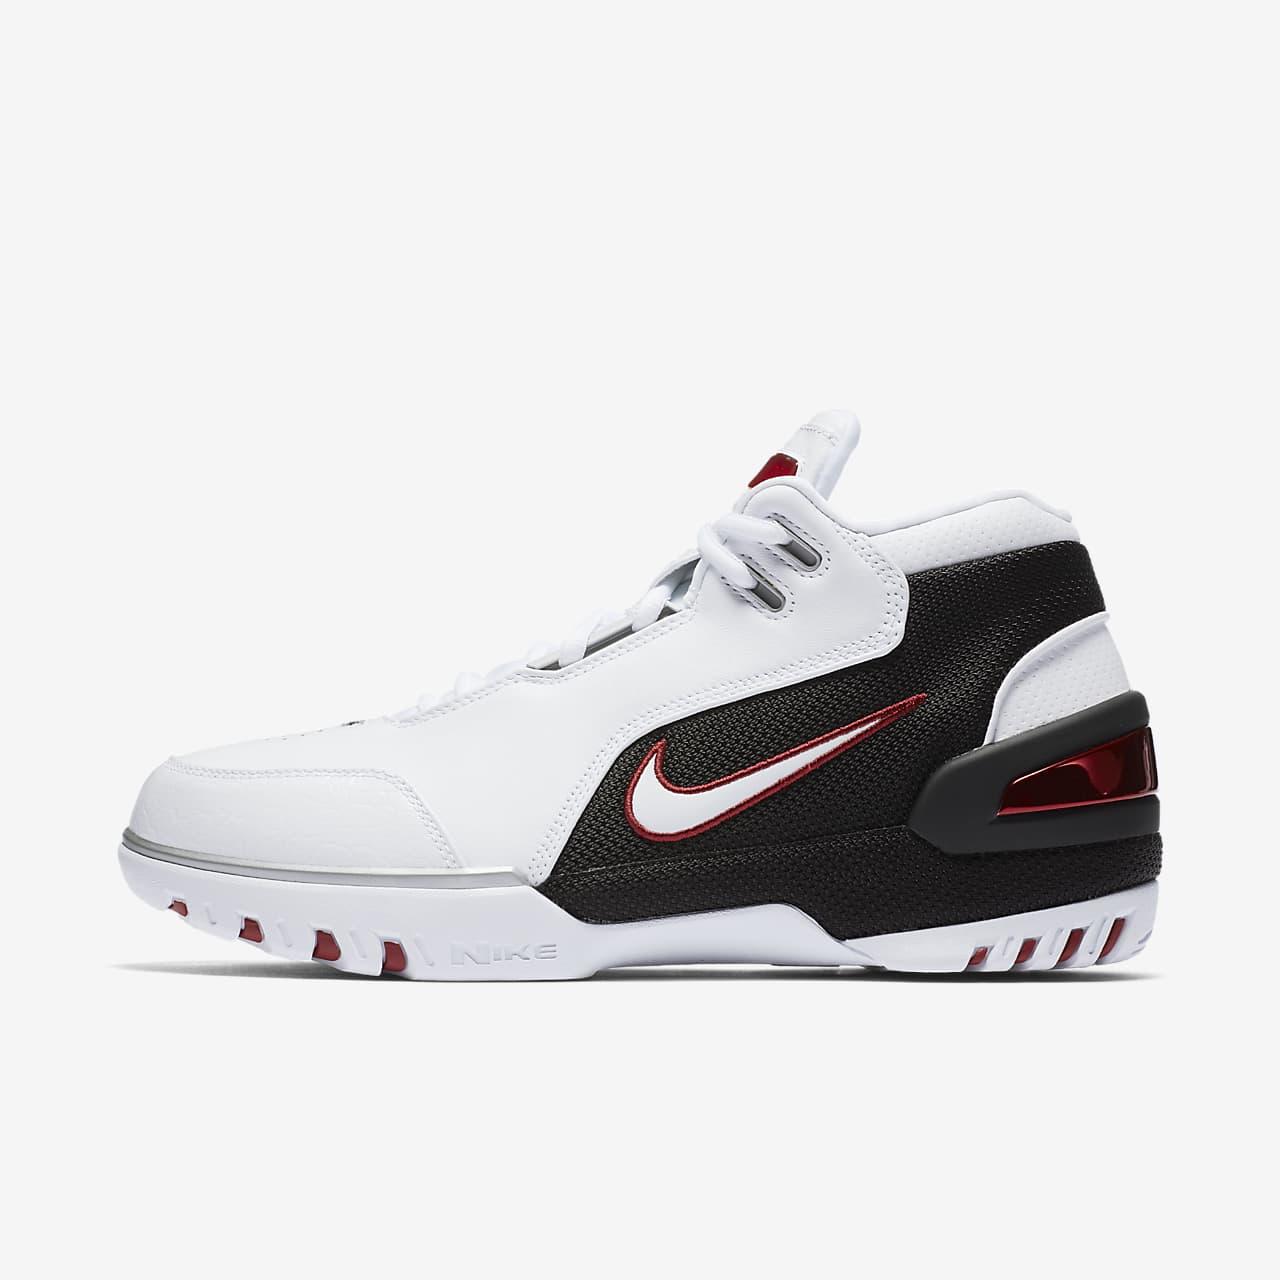 Chaussure de basketball Nike Air Zoom Generation QS pour Homme